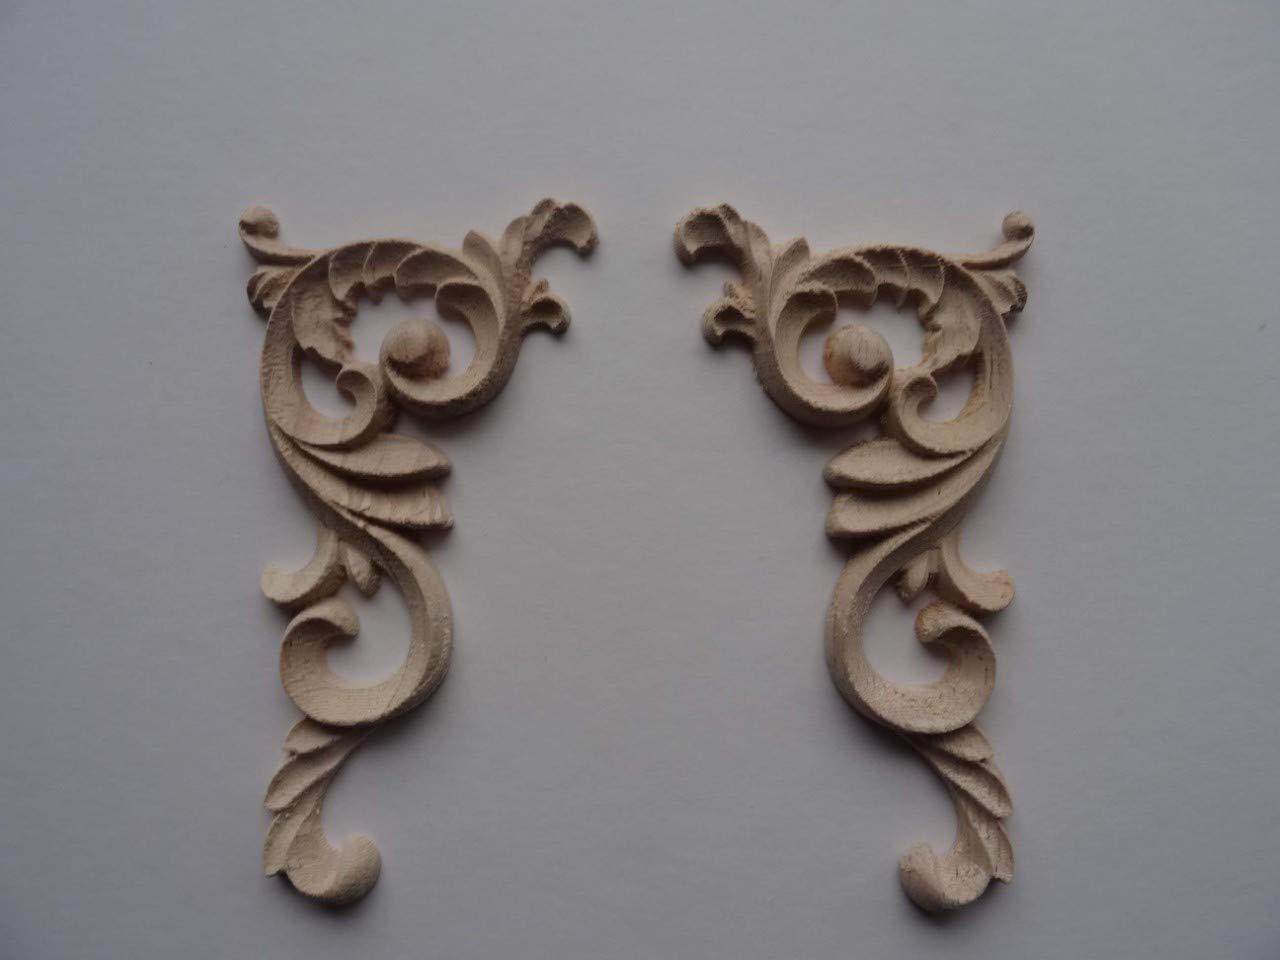 Decorative wooden corner scrolls x 2 applique onlay furniture